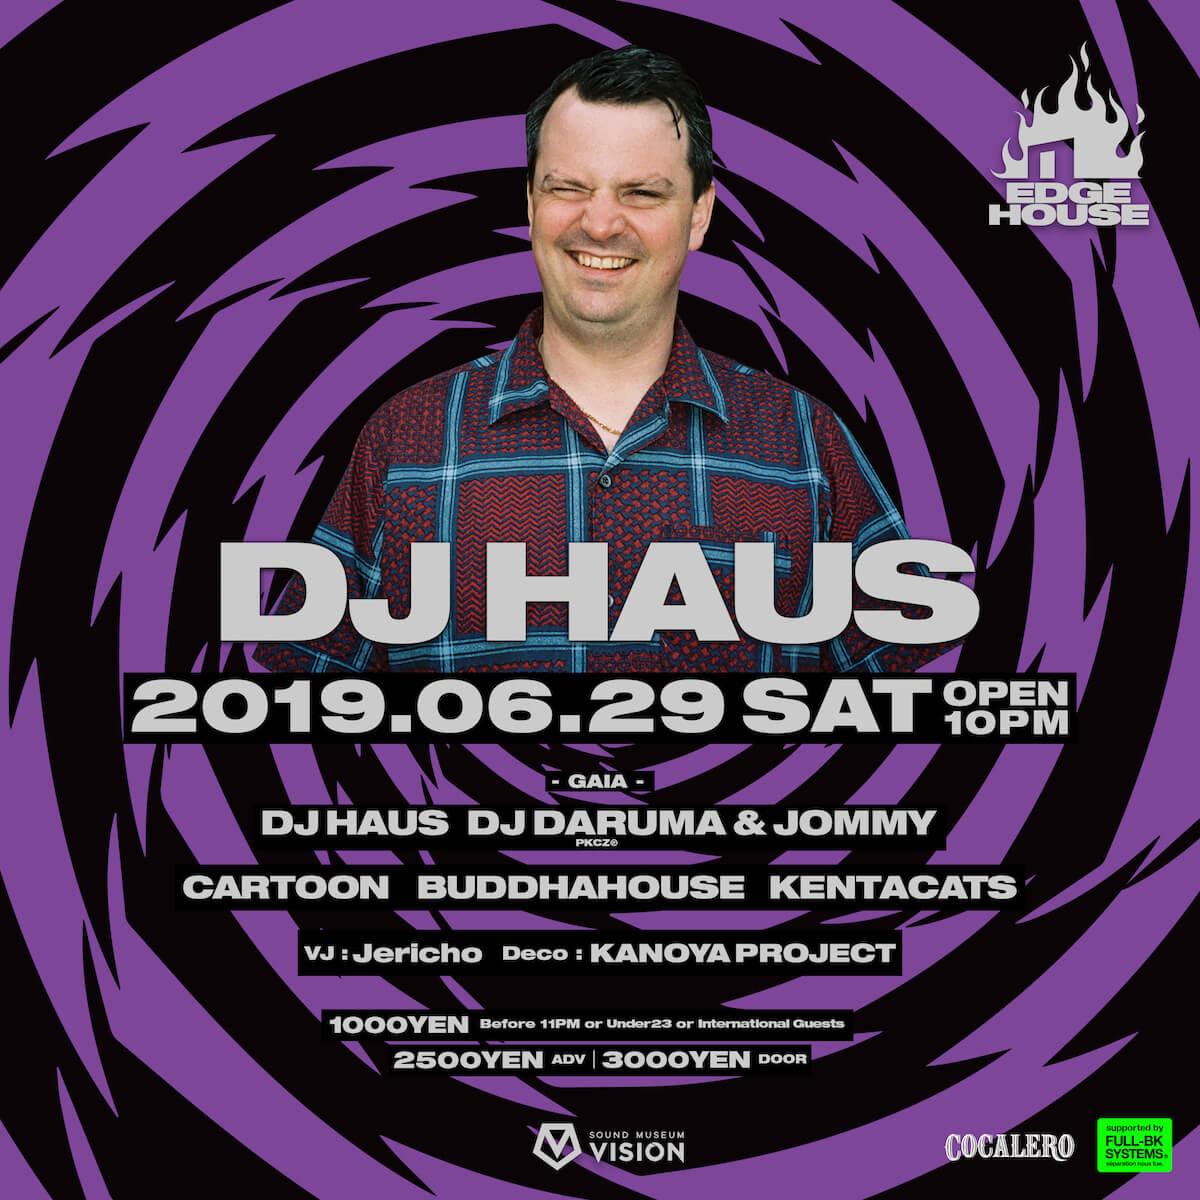 〈Unknown to the Unknown〉のボス、DJ Hausが登場 6月29日の<EDGE HOUSE>でプレイ music190618vision-edgehouse-djhaus_1.jpg